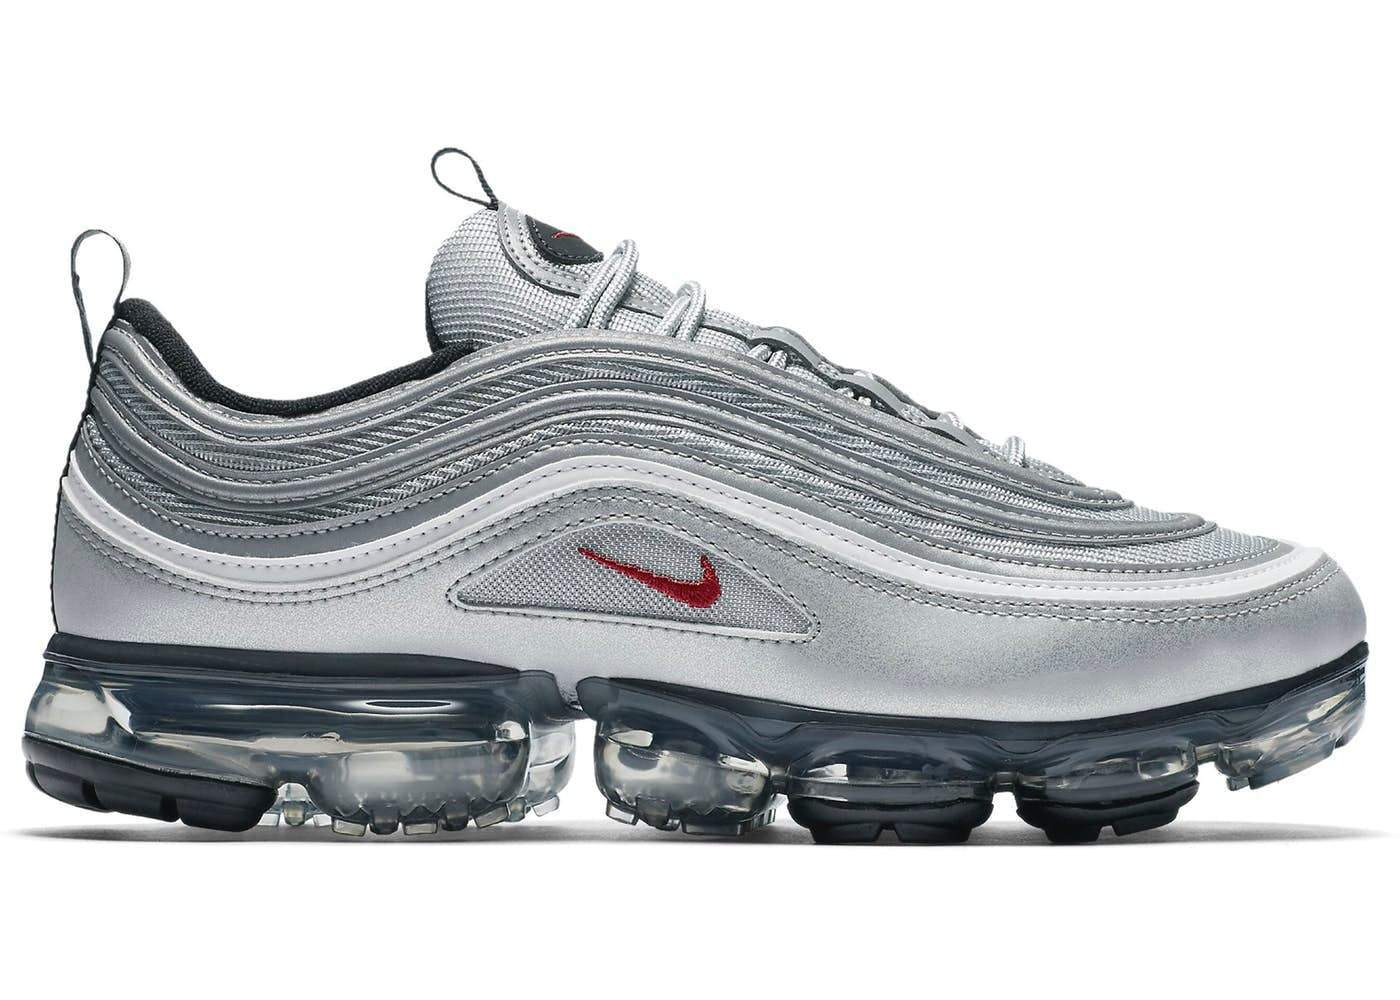 separation shoes 5163f 3cff8 Nike Air VaporMax 97 Silver Bullet | AJ7291-002 - True Looks